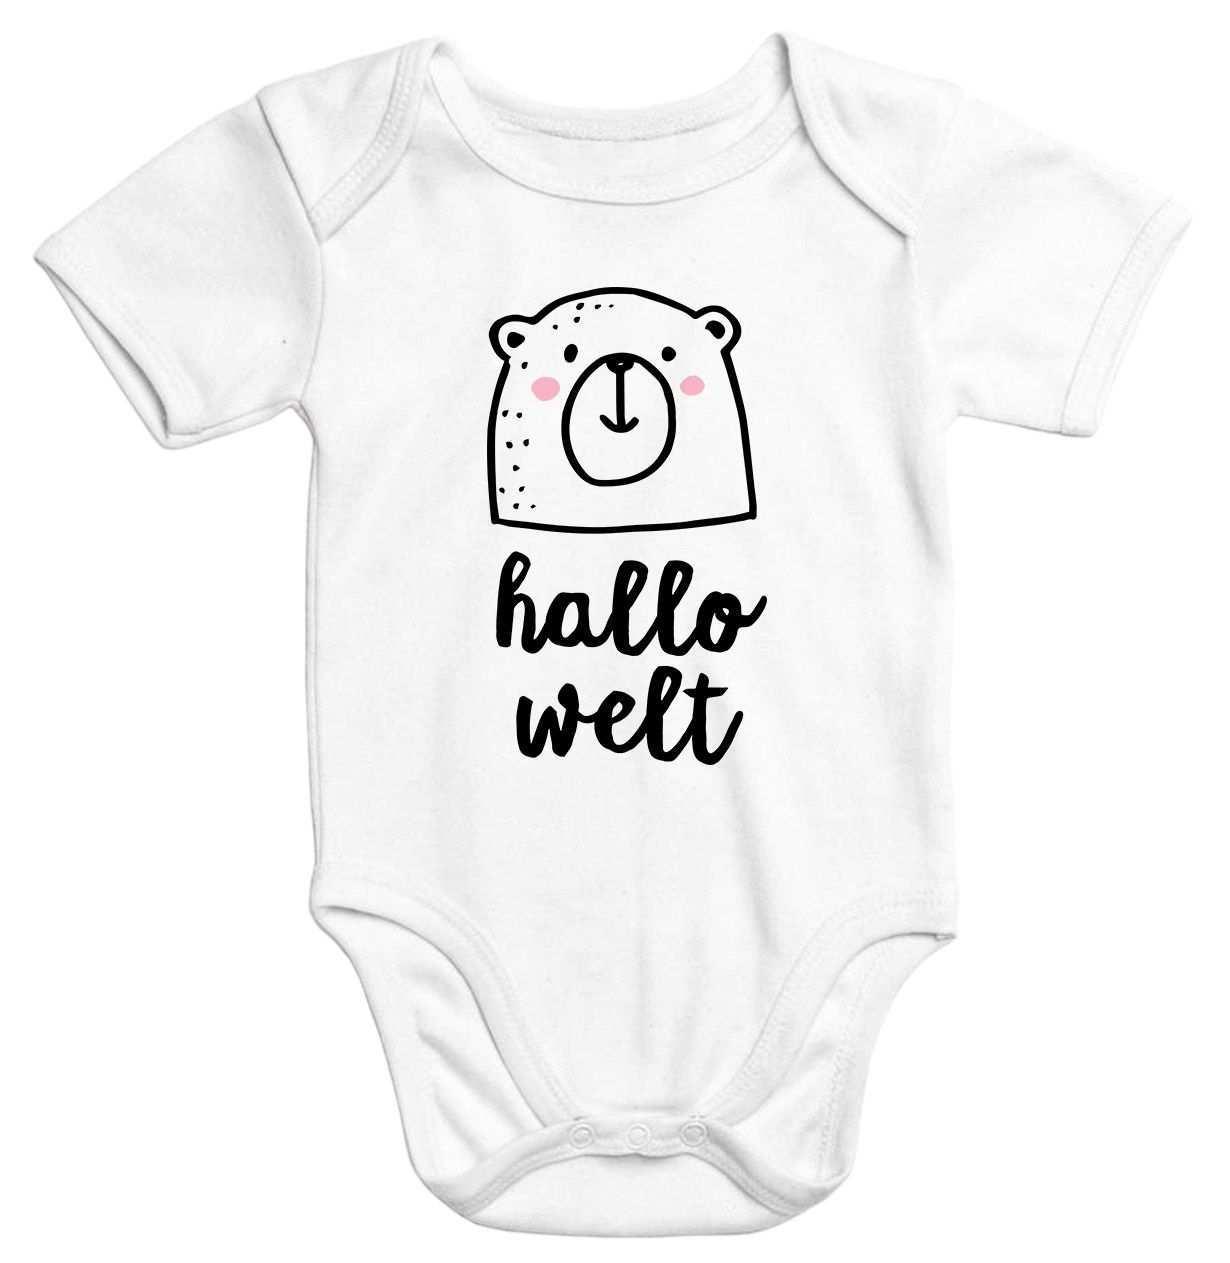 Kurzarm Baby Body Hallo Welt Bar Hello World Bear Einteiler Bio Baumwolle Moonworks Baby Body Spruche Baby Babybody